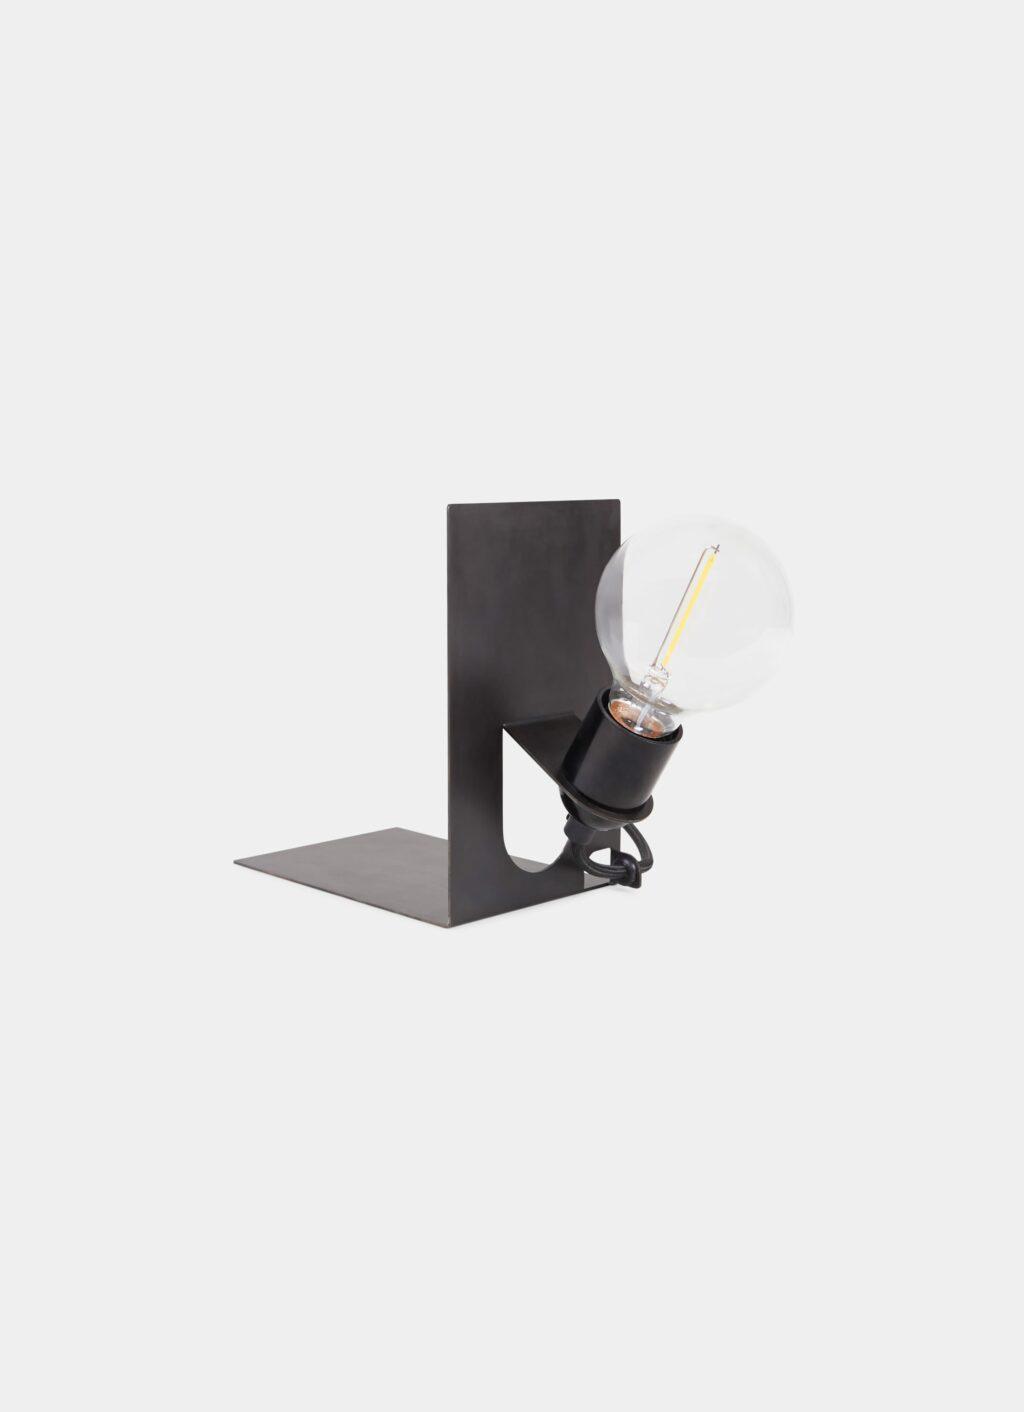 Frama - AML - Library Lamp